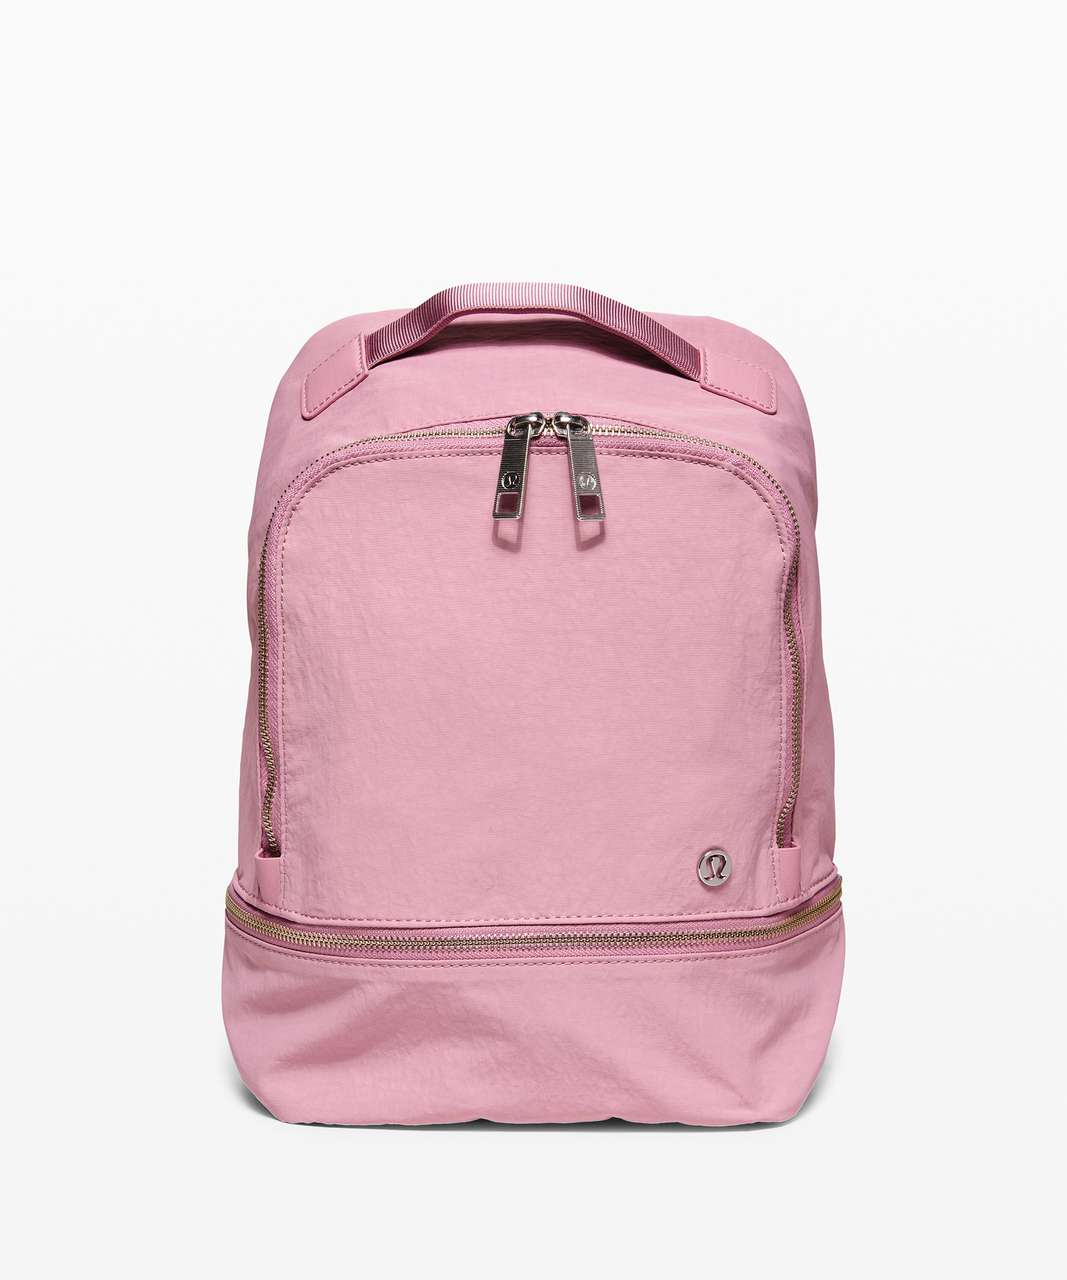 Lululemon City Adventurer Backpack Mini *10L - Pink Taupe